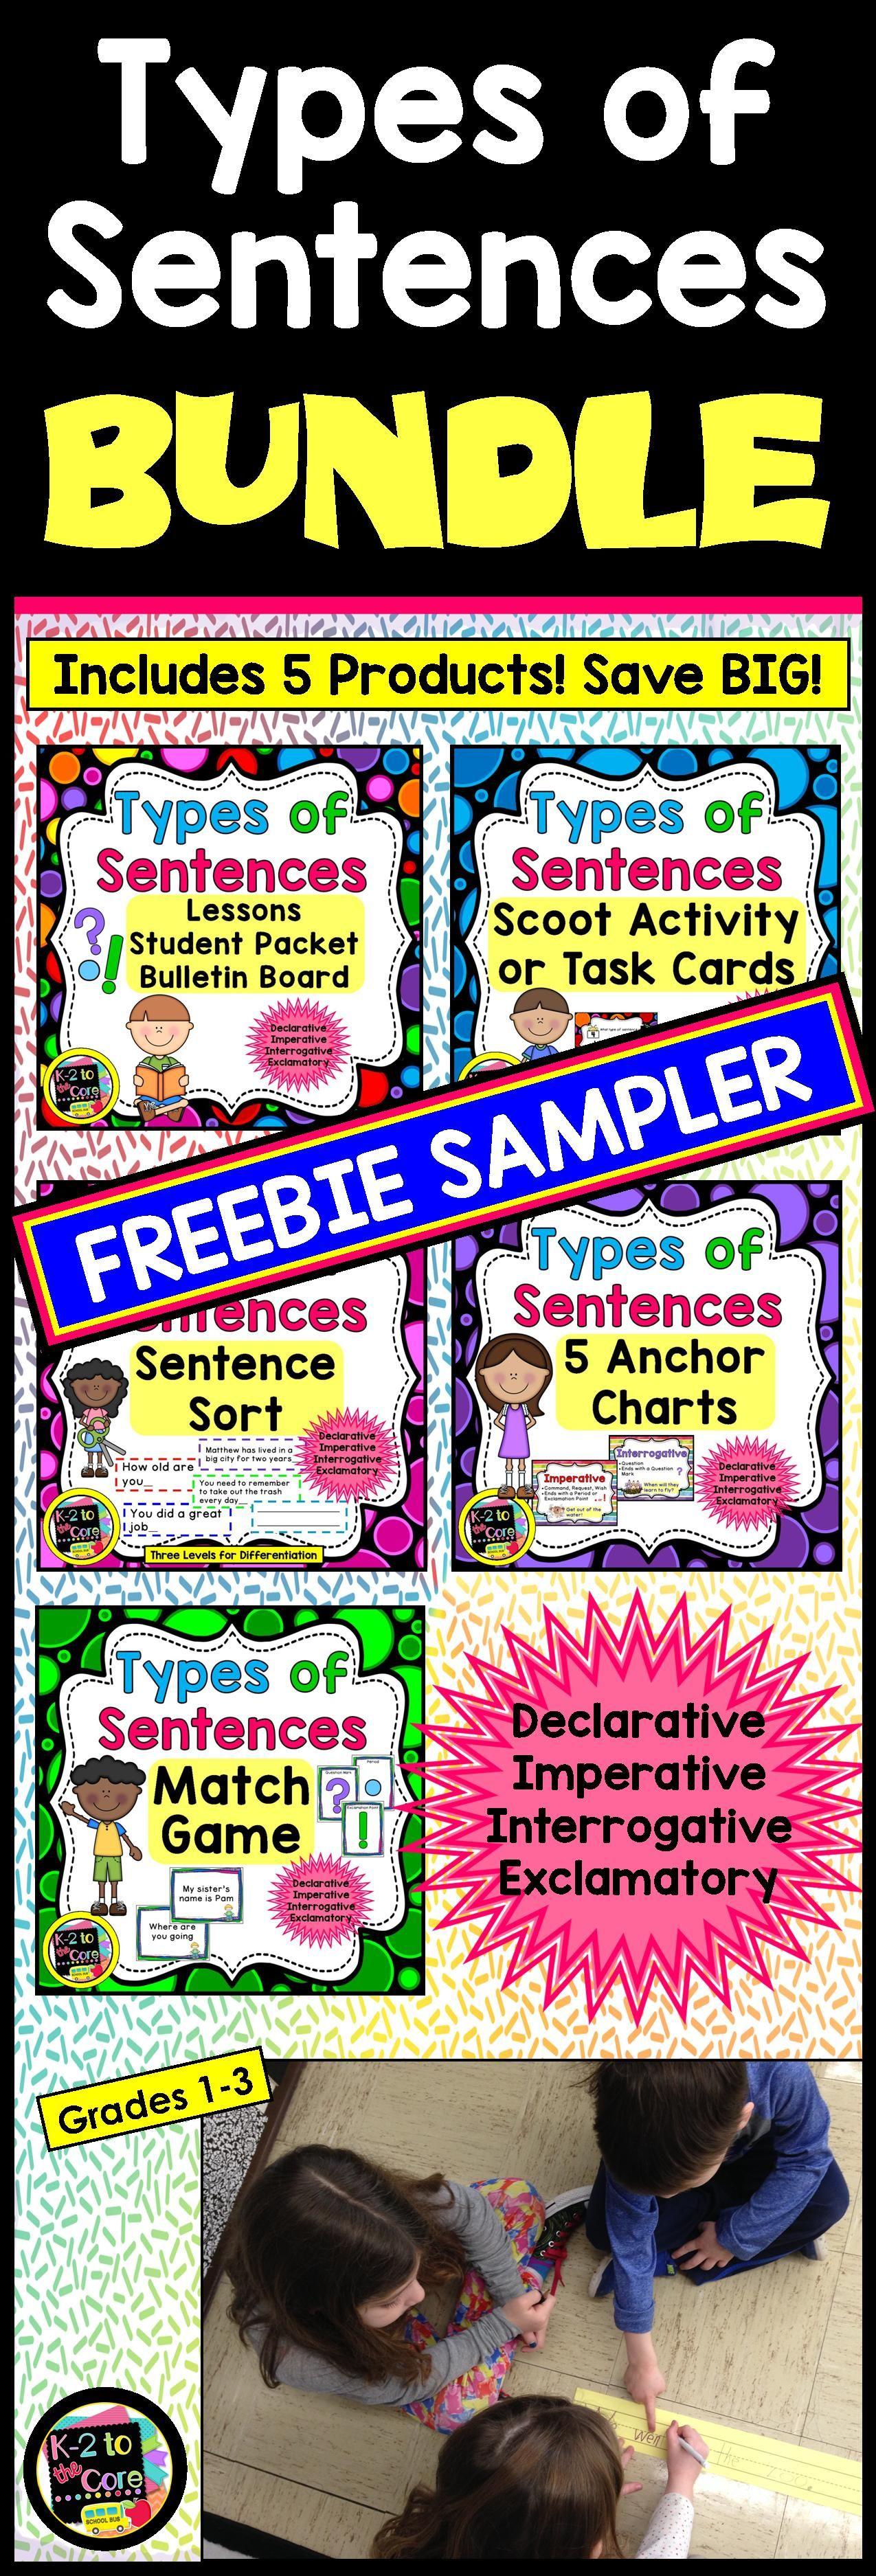 Types Of Sentences Amp Punctuation Freebie Sampler